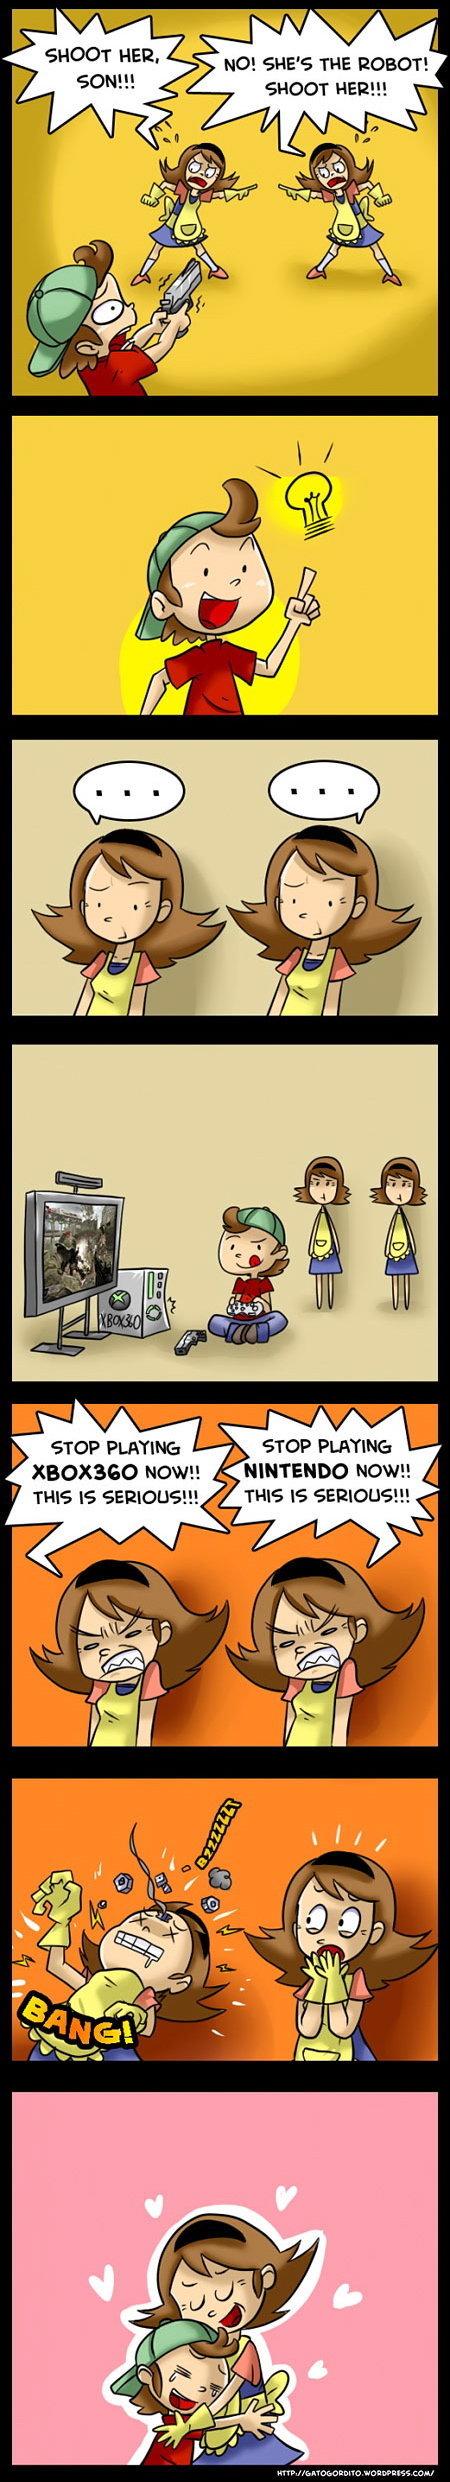 Title. . NO! tittys THE ROBOT! SHEET HER!!! b STOP PLATINA: ', 9, STOP PLAYING: